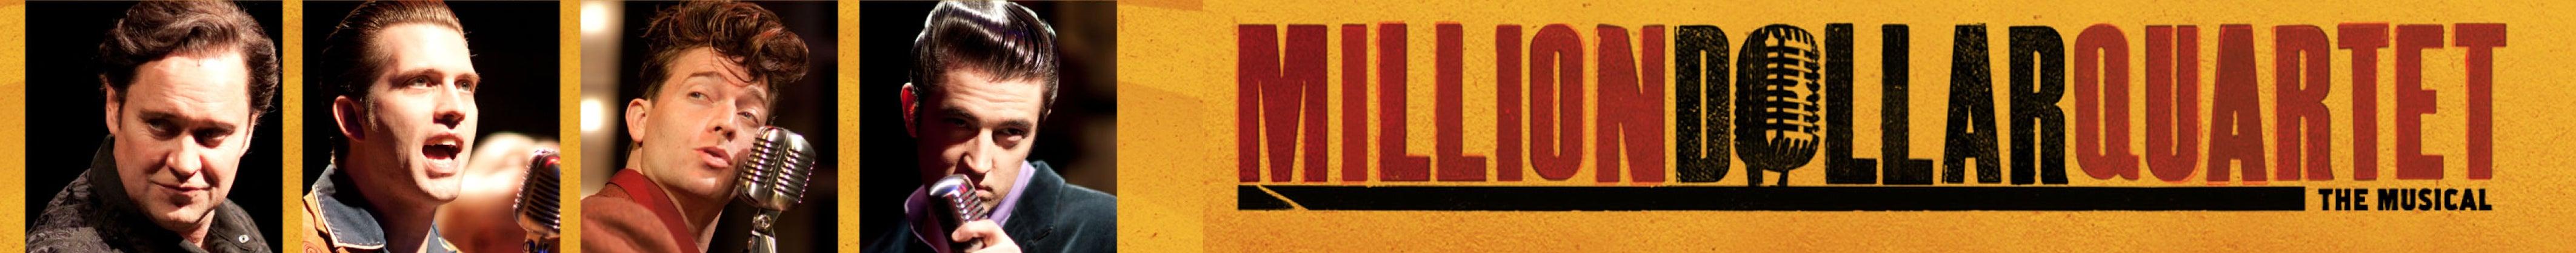 mdq banner.jpg